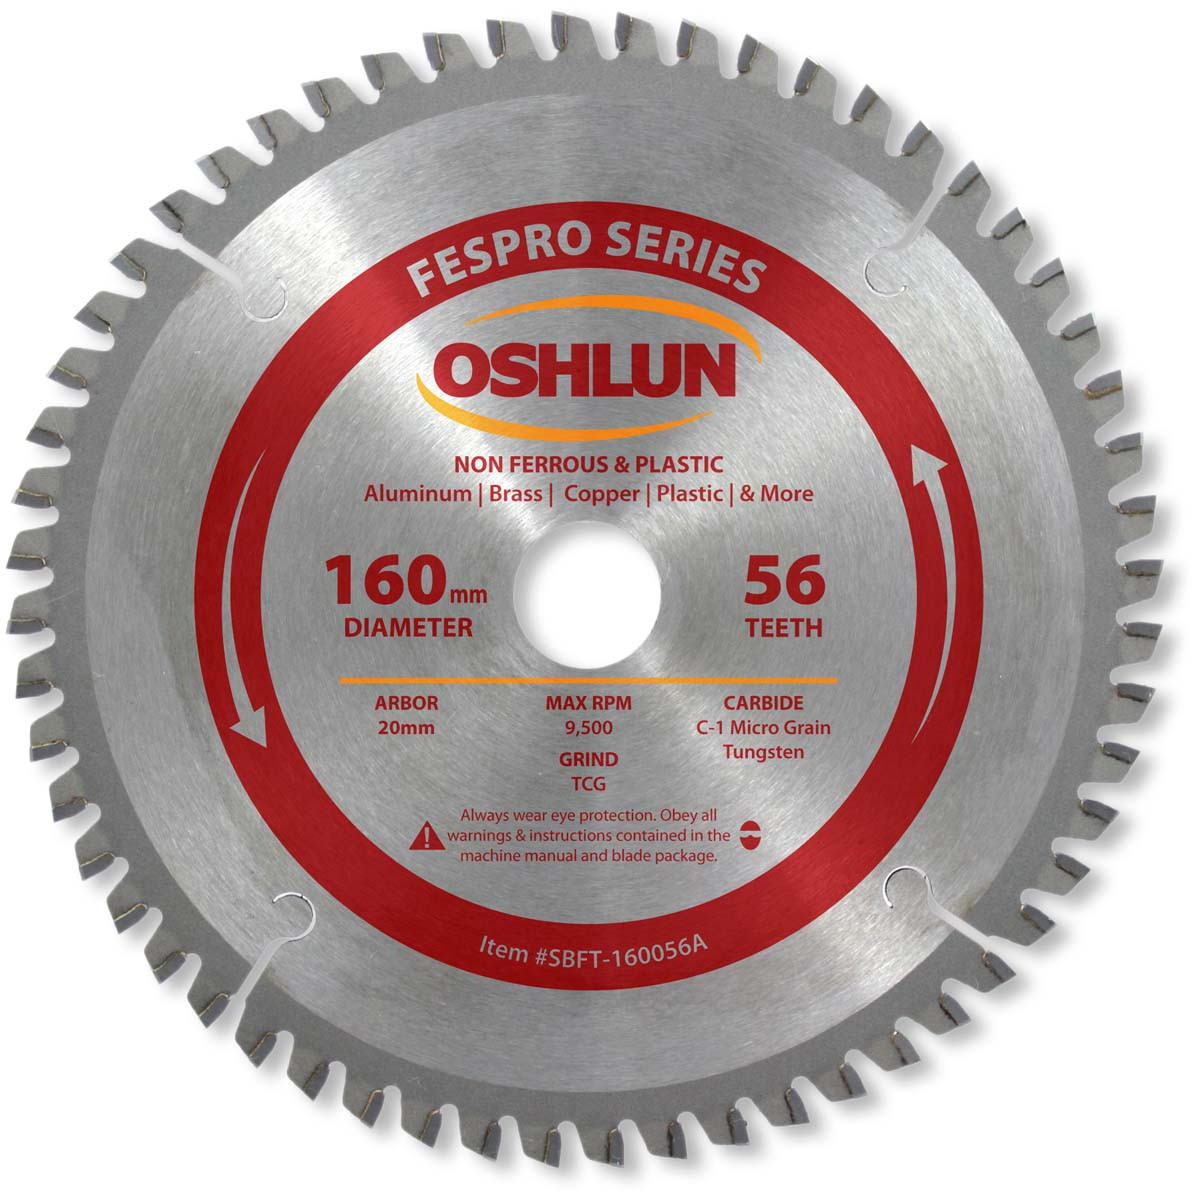 Fespro non ferrous saw blade 160mm x 56t x 20mm arbor oshlun sbft fespro non ferrous saw blade 160mm x 56t x 20mm arbor oshlun sbft 160056a greentooth Images